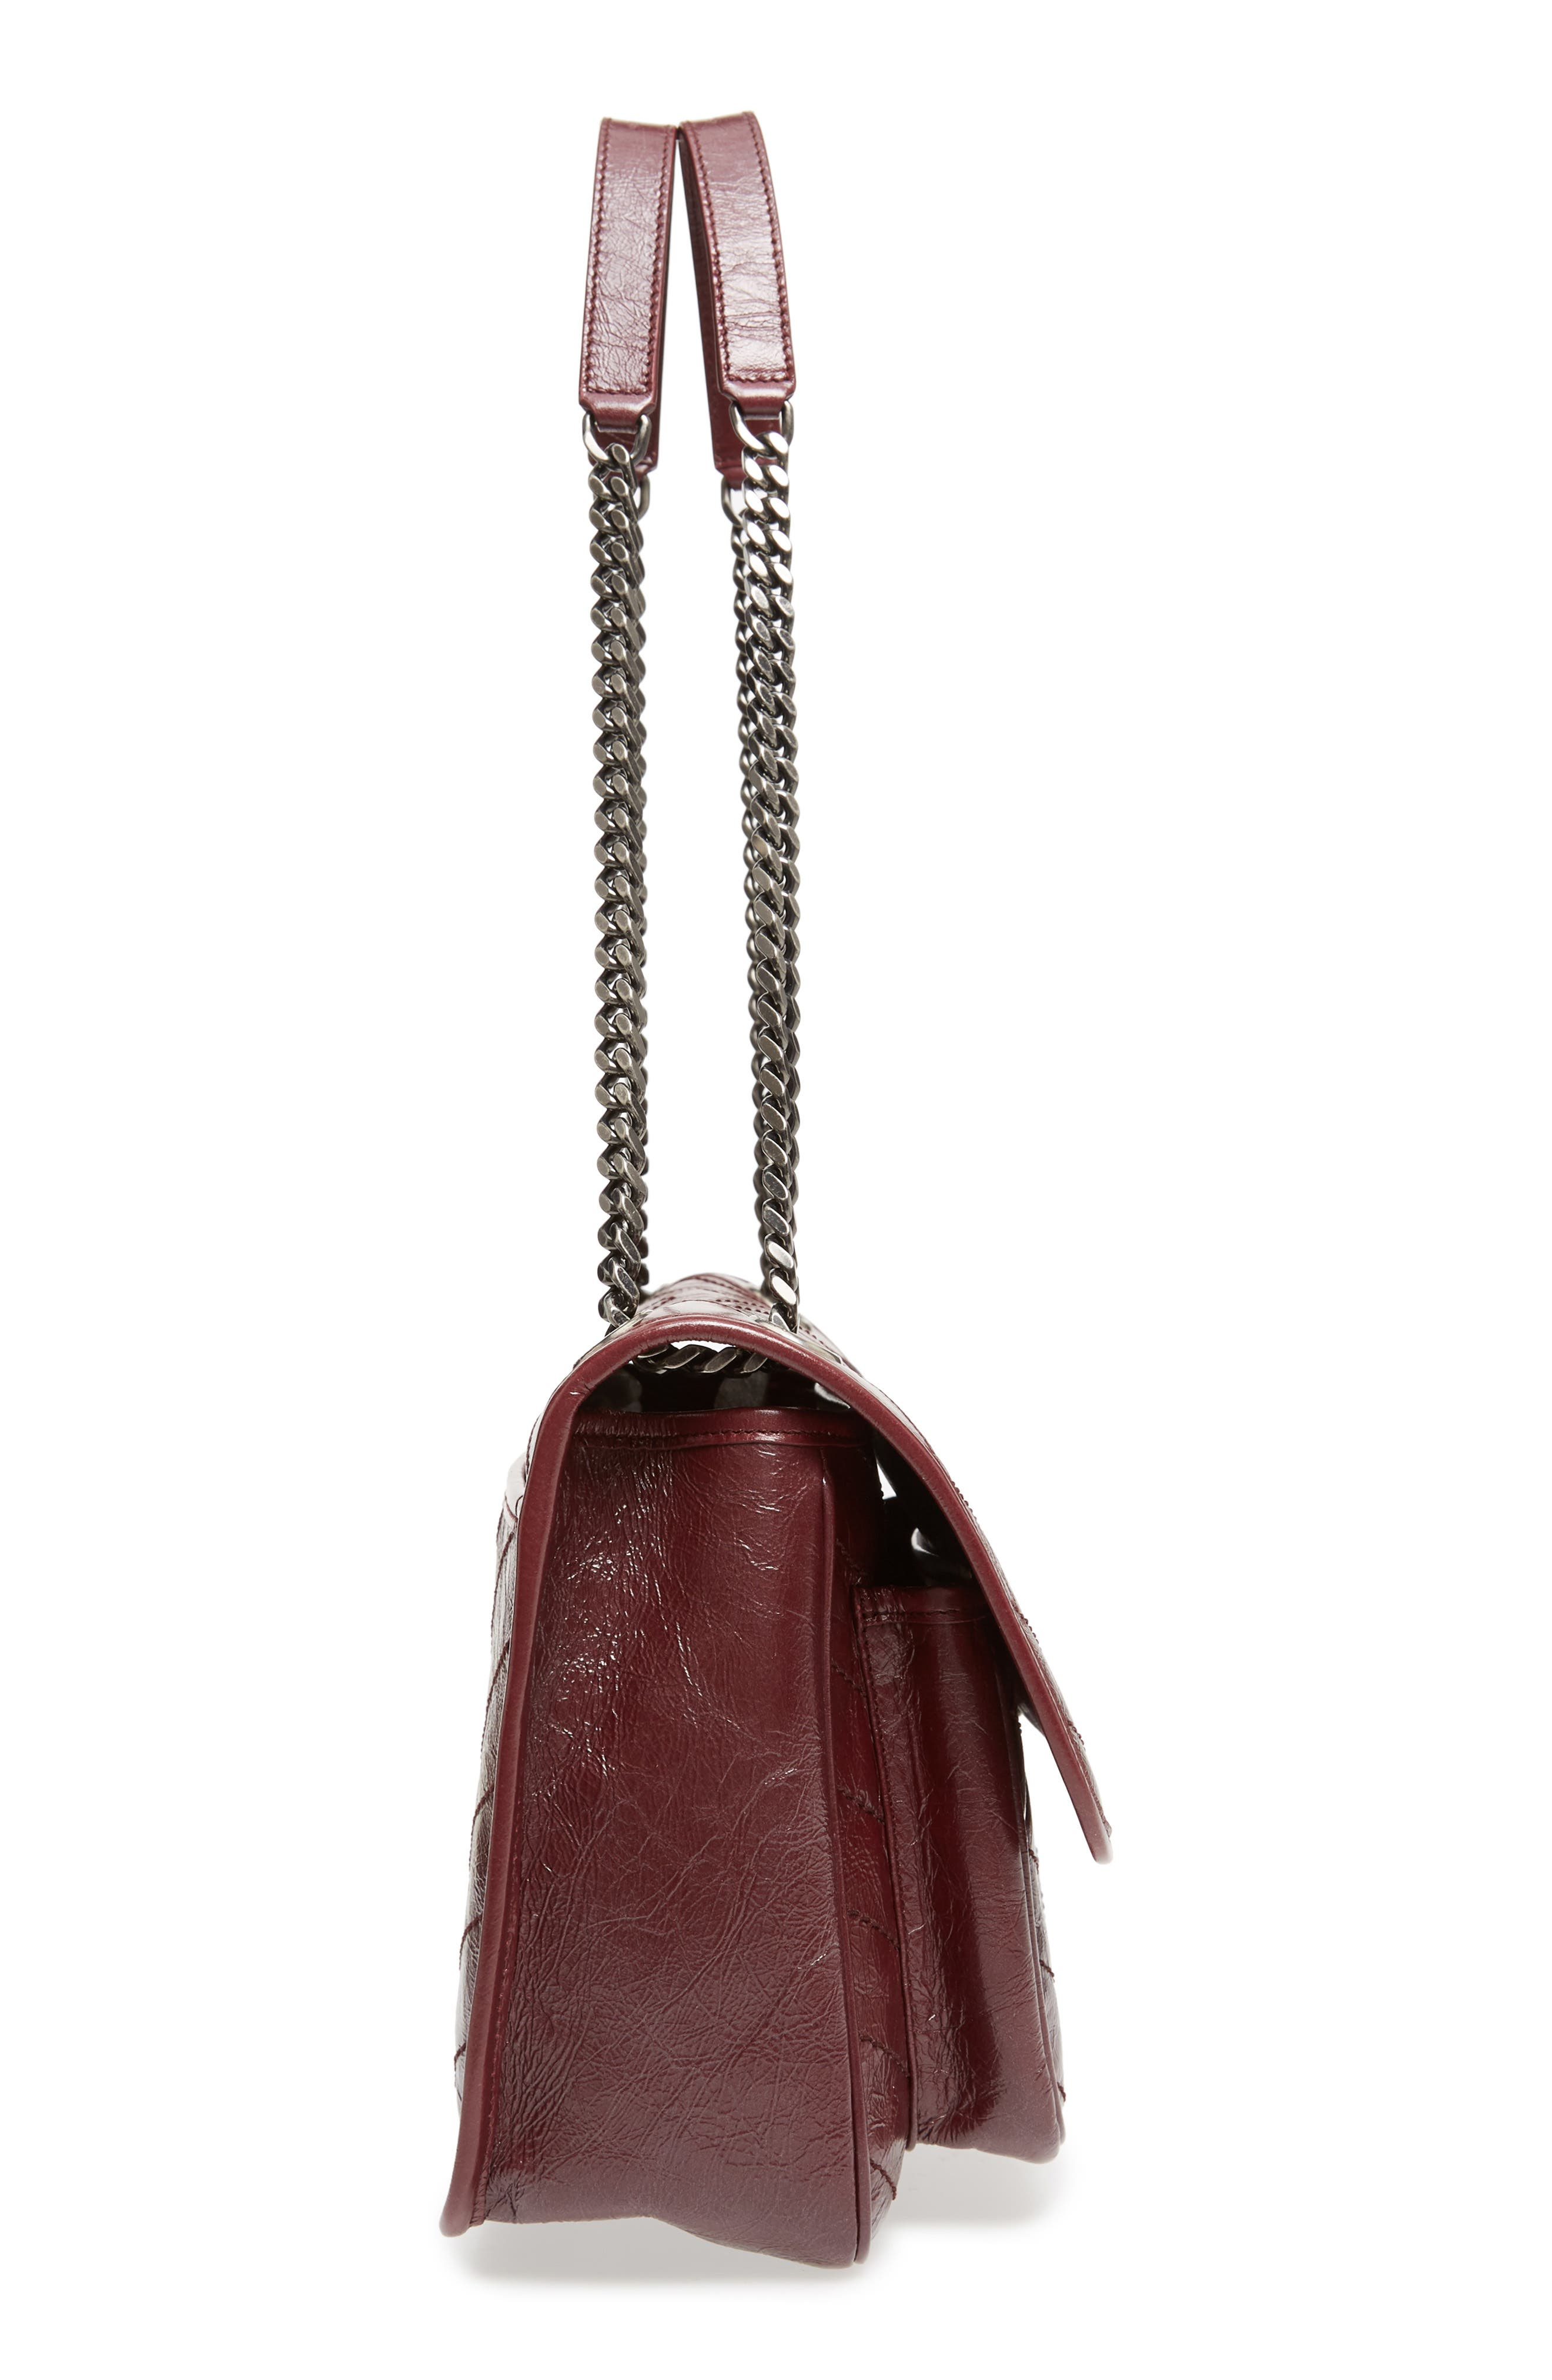 Medium Niki Leather Shoulder Bag,                             Alternate thumbnail 5, color,                             Rouge Legion